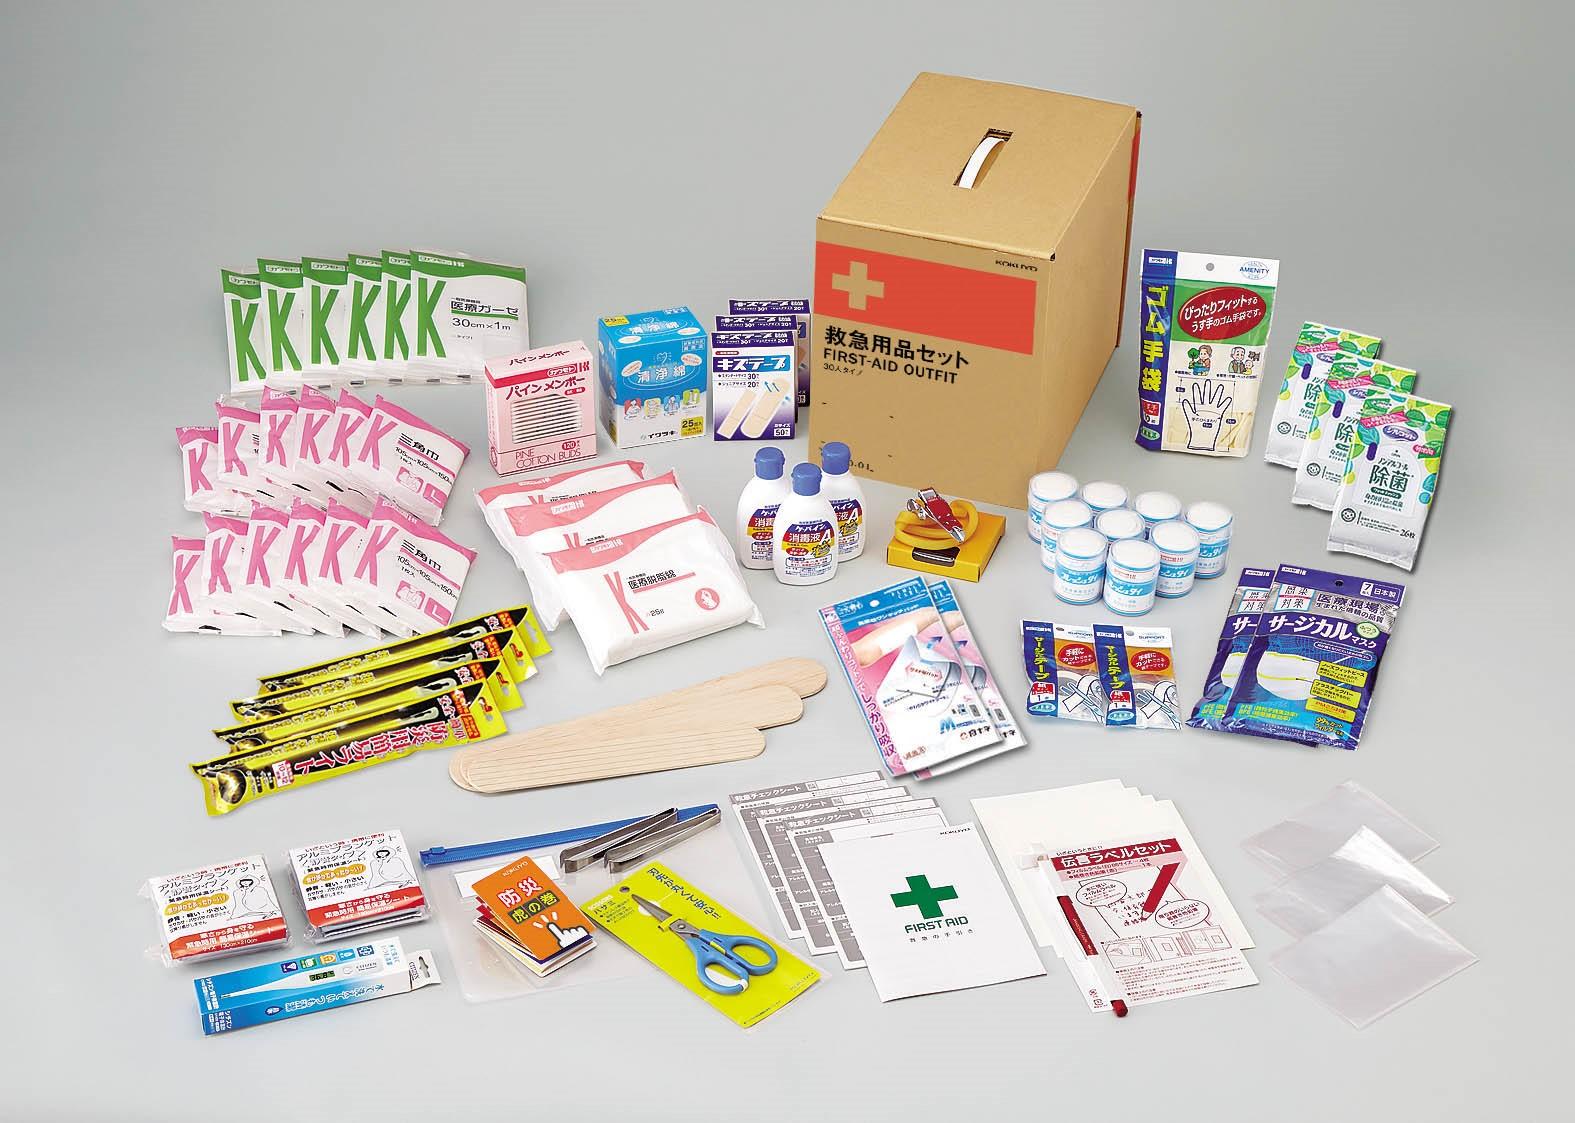 PARTS-FIT 救急用品セット 30人タイプ